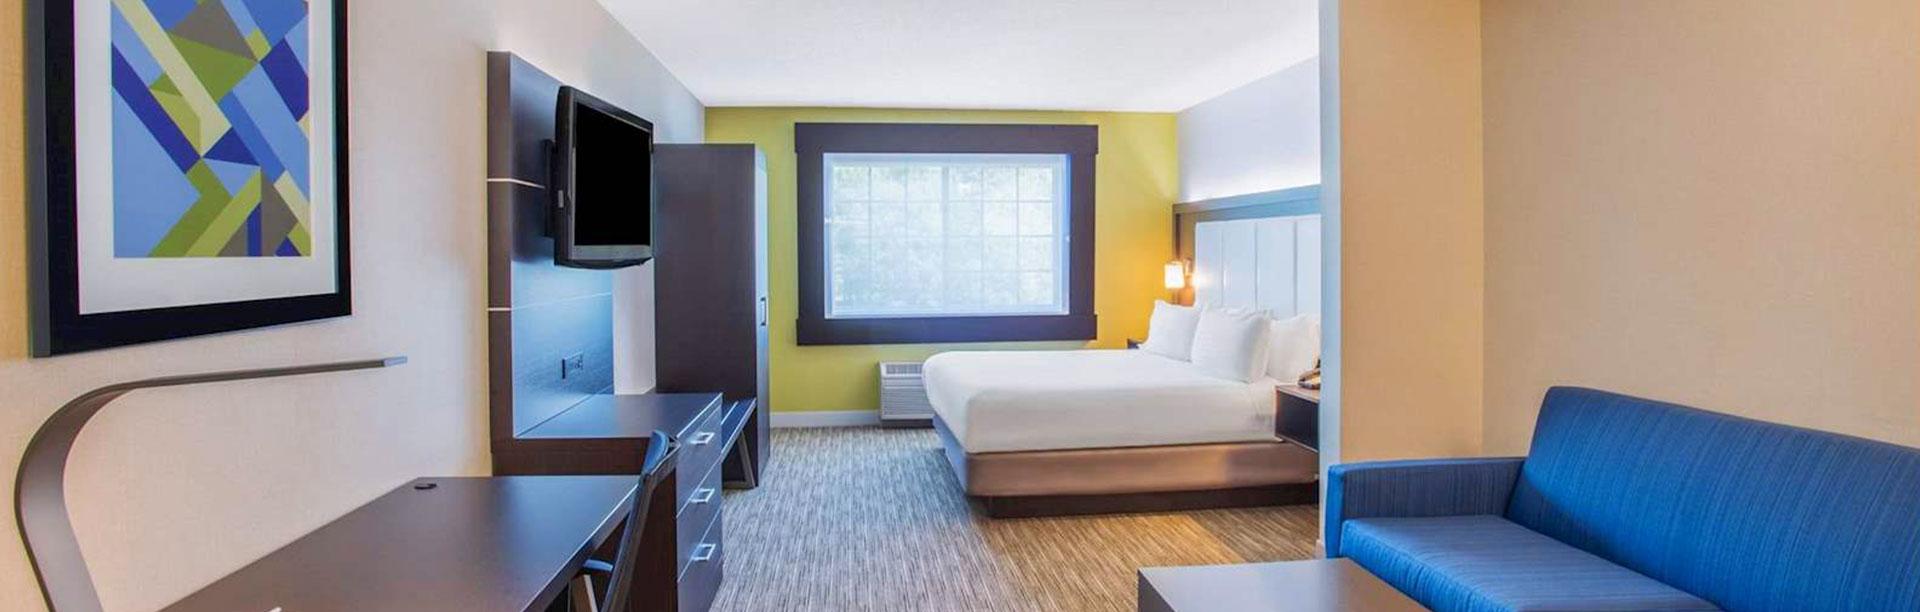 Guestrooms at Holiday Inn Express Hotel & Suites Atascadero